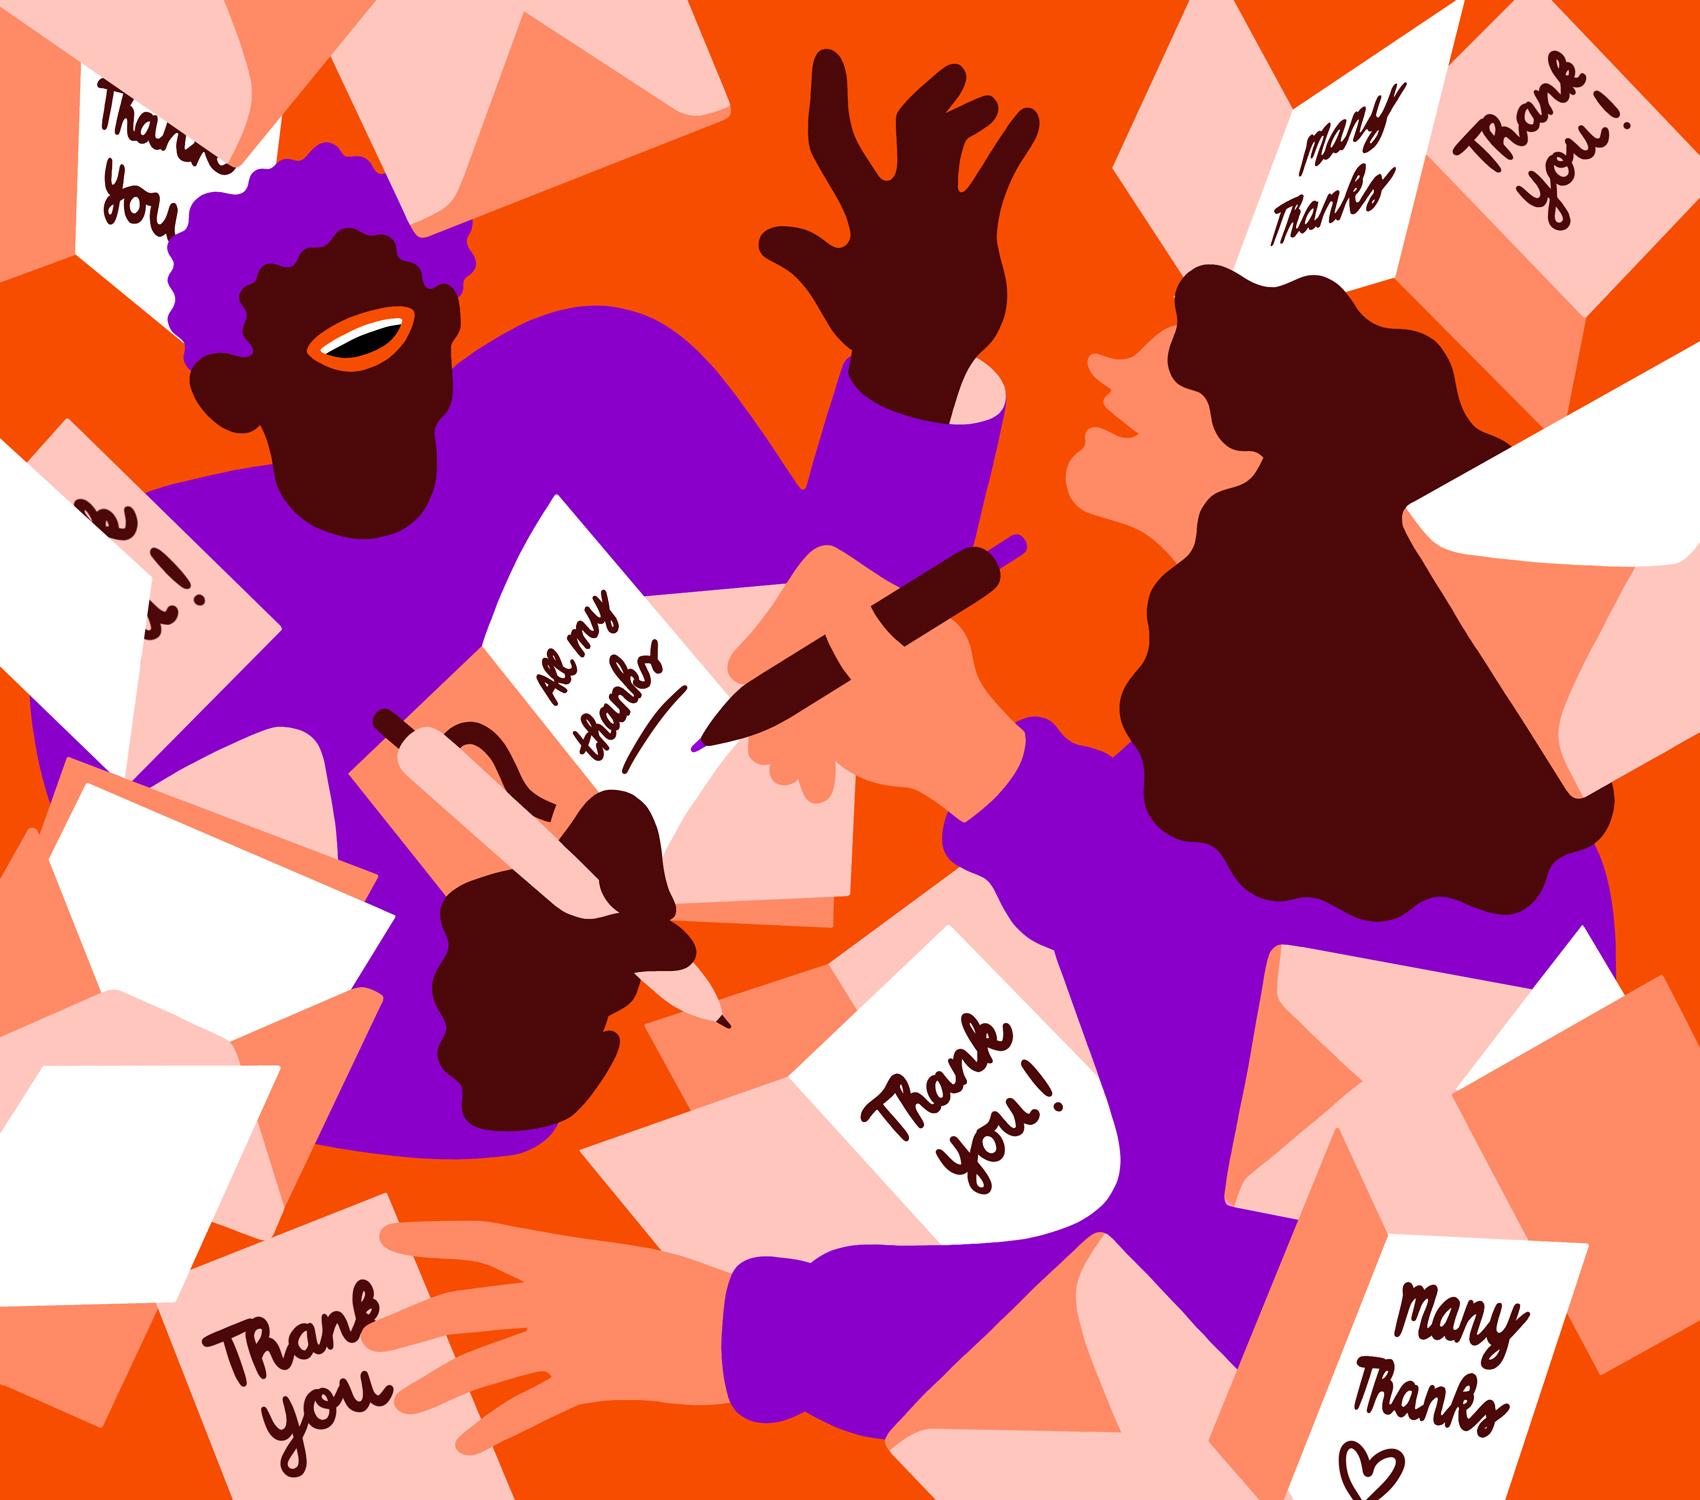 newscientist_thank-you-notes_web_lisategtmeier.jpg